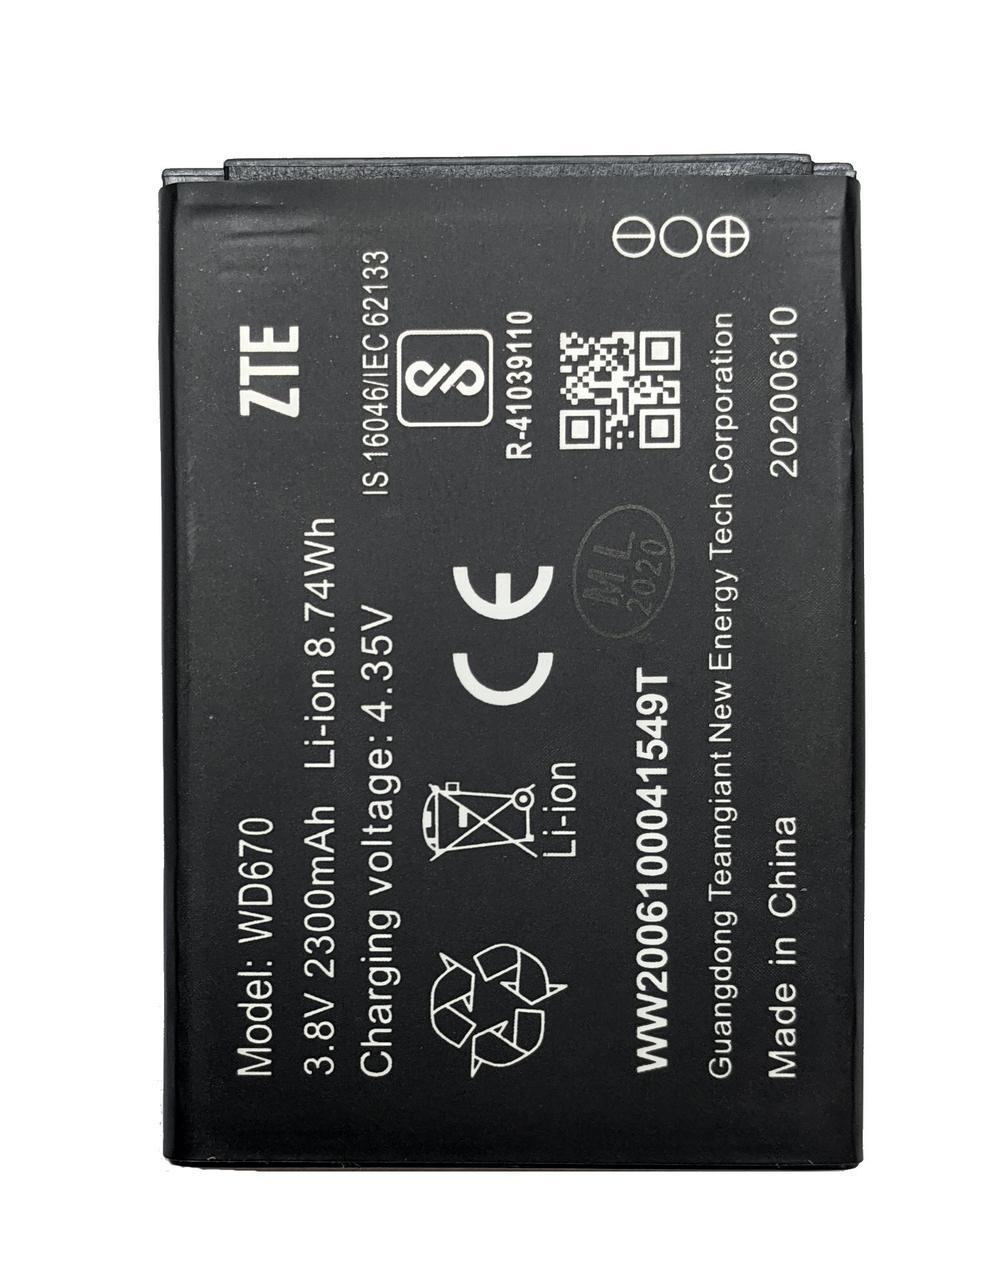 ZTE WD670 4G LTE Wi-Fi Router Haier H12348 Аккумулятор Батарея